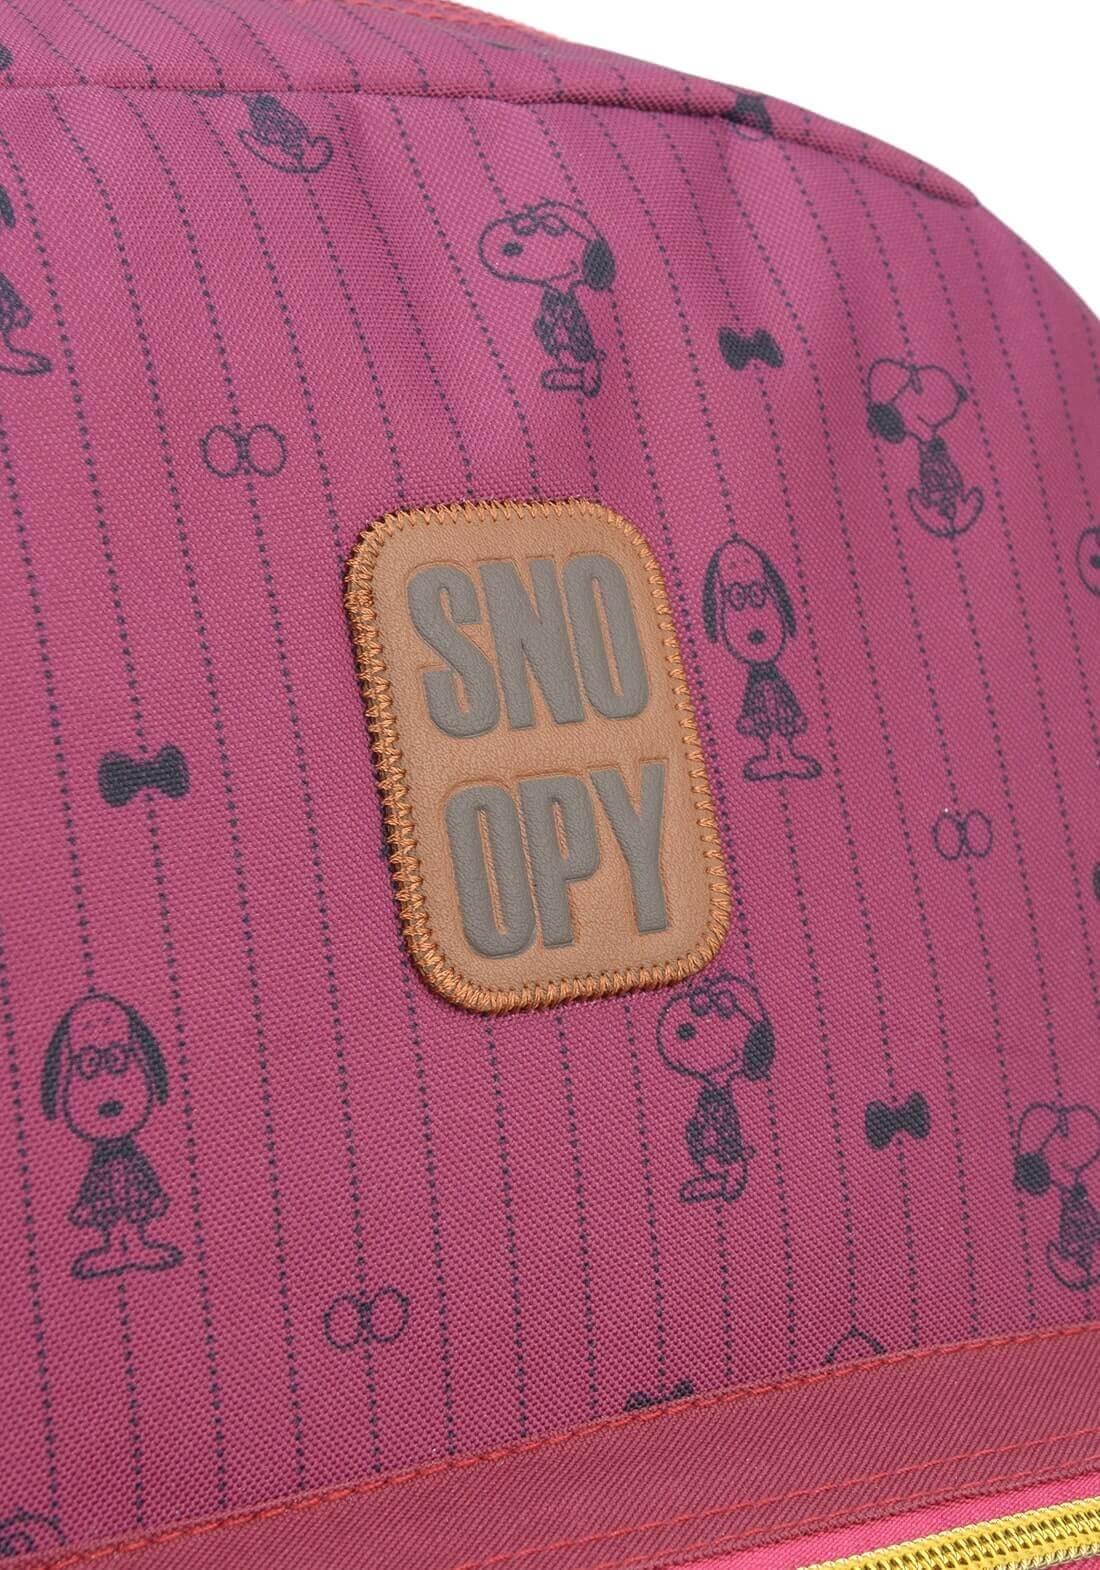 Mochila Peanuts Snoopy de Costas Notebook Original Vinho